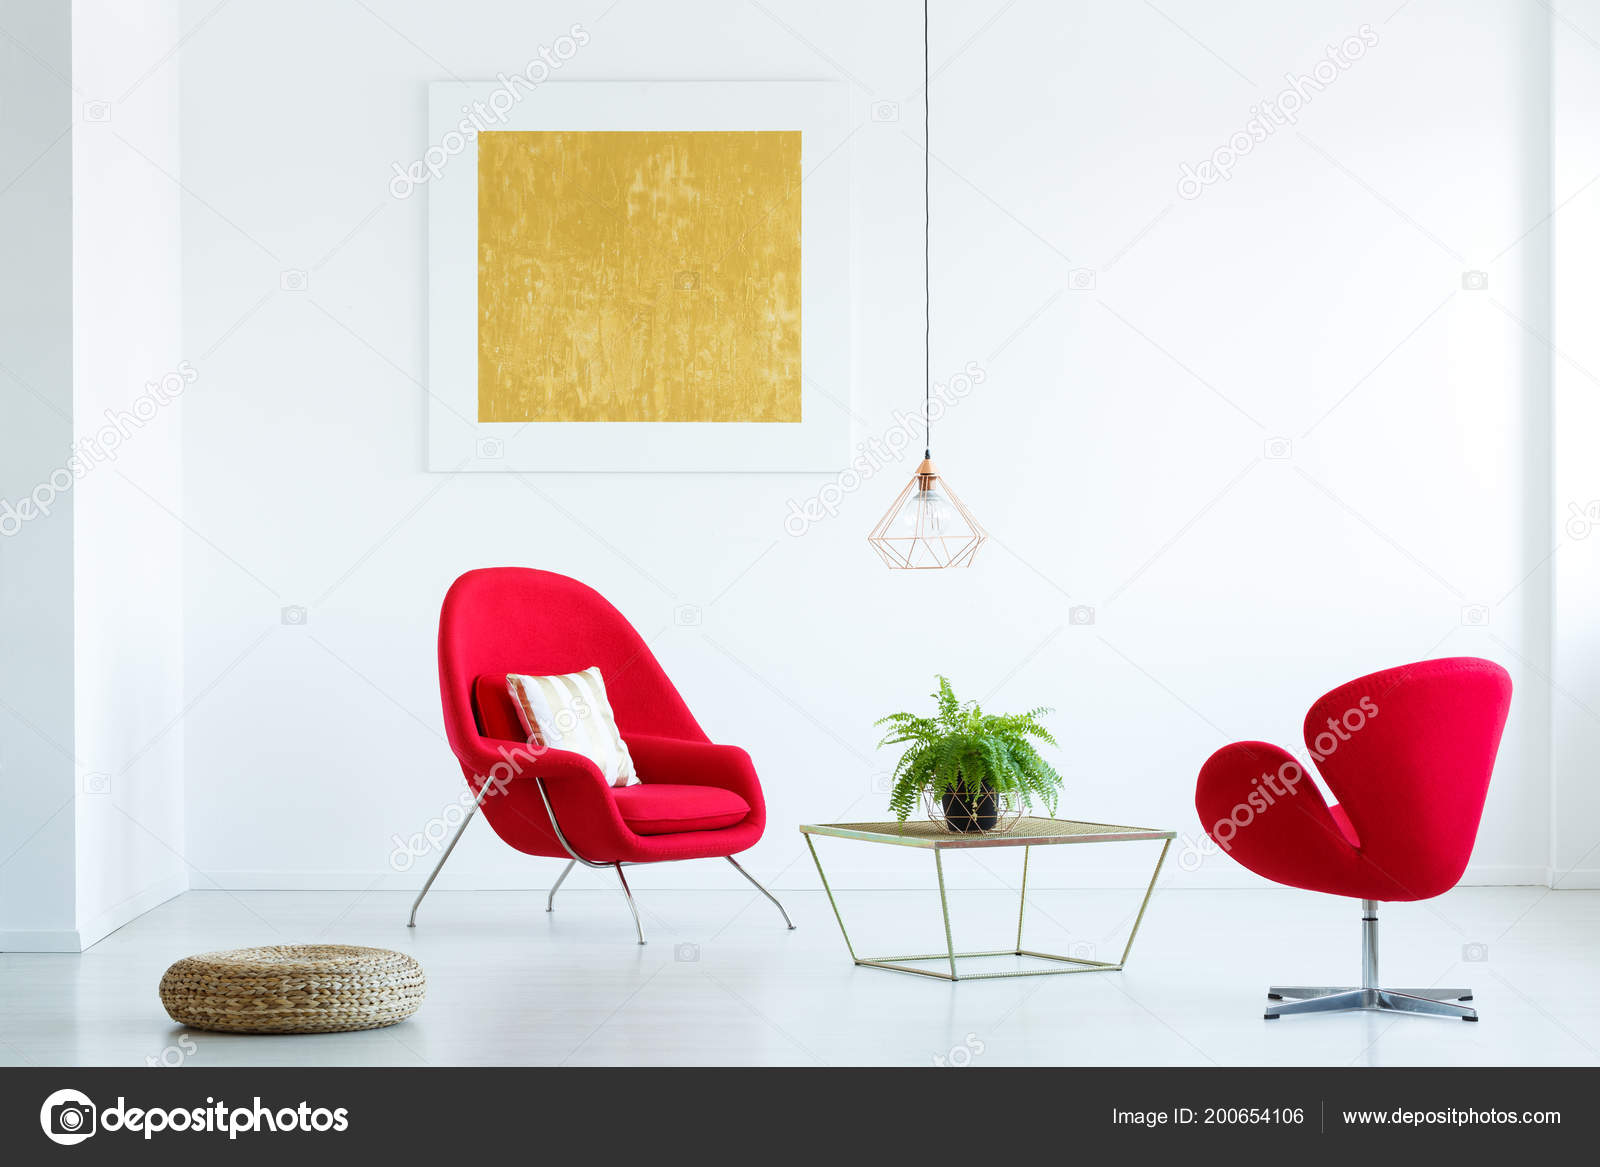 Table Fern Red Armchairs Modern Loft Interior Yellow Painting Pouf U2014 Stock  Photo